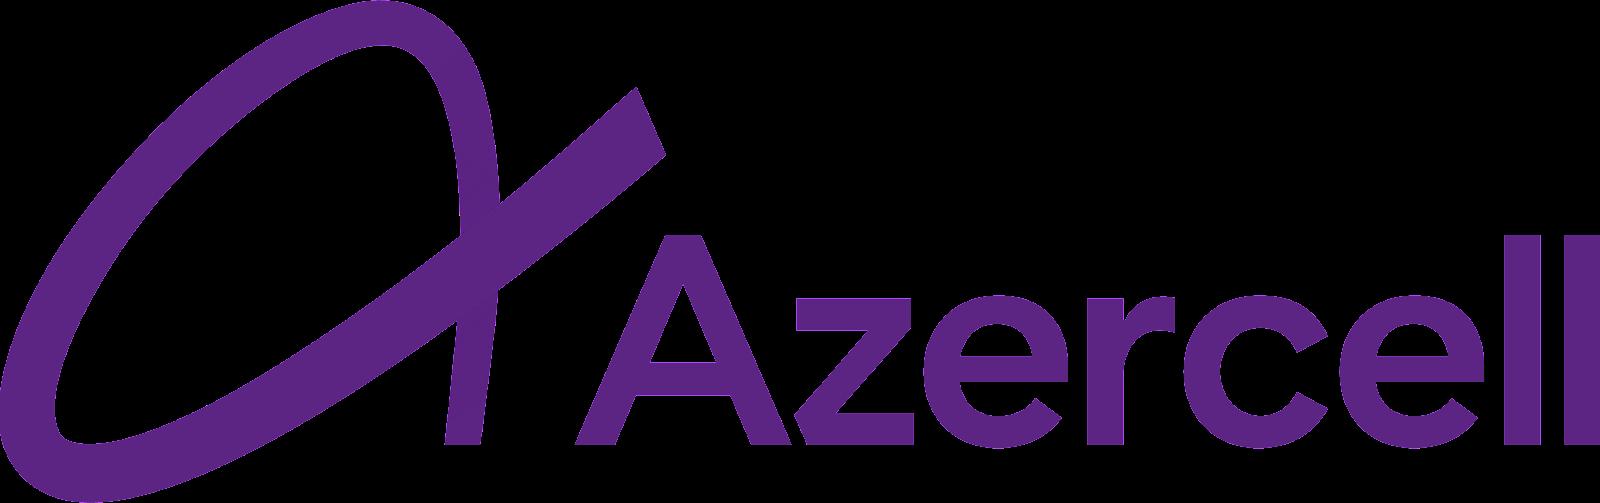 Caring for the Azerbaijan Community